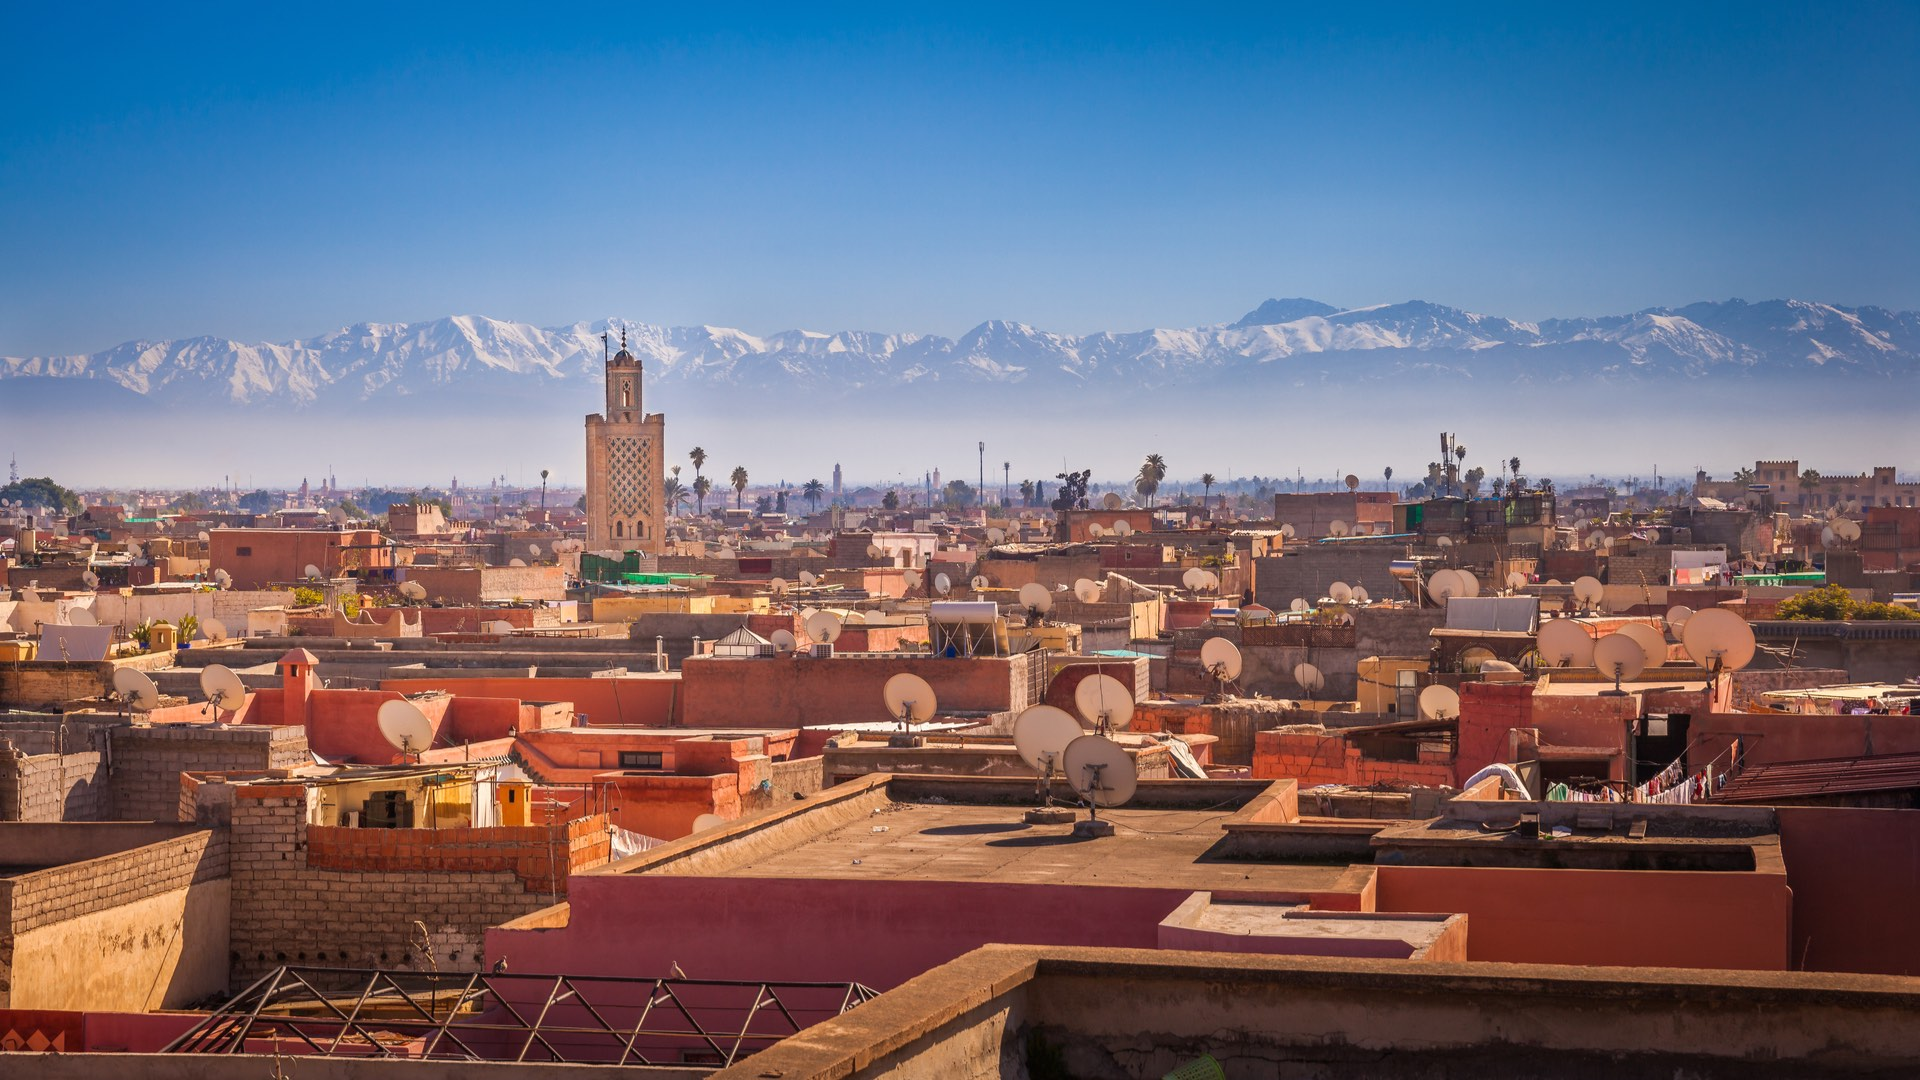 Marokko | Marrakesh | ©Maurizio De Mattei/Shutterstock.com